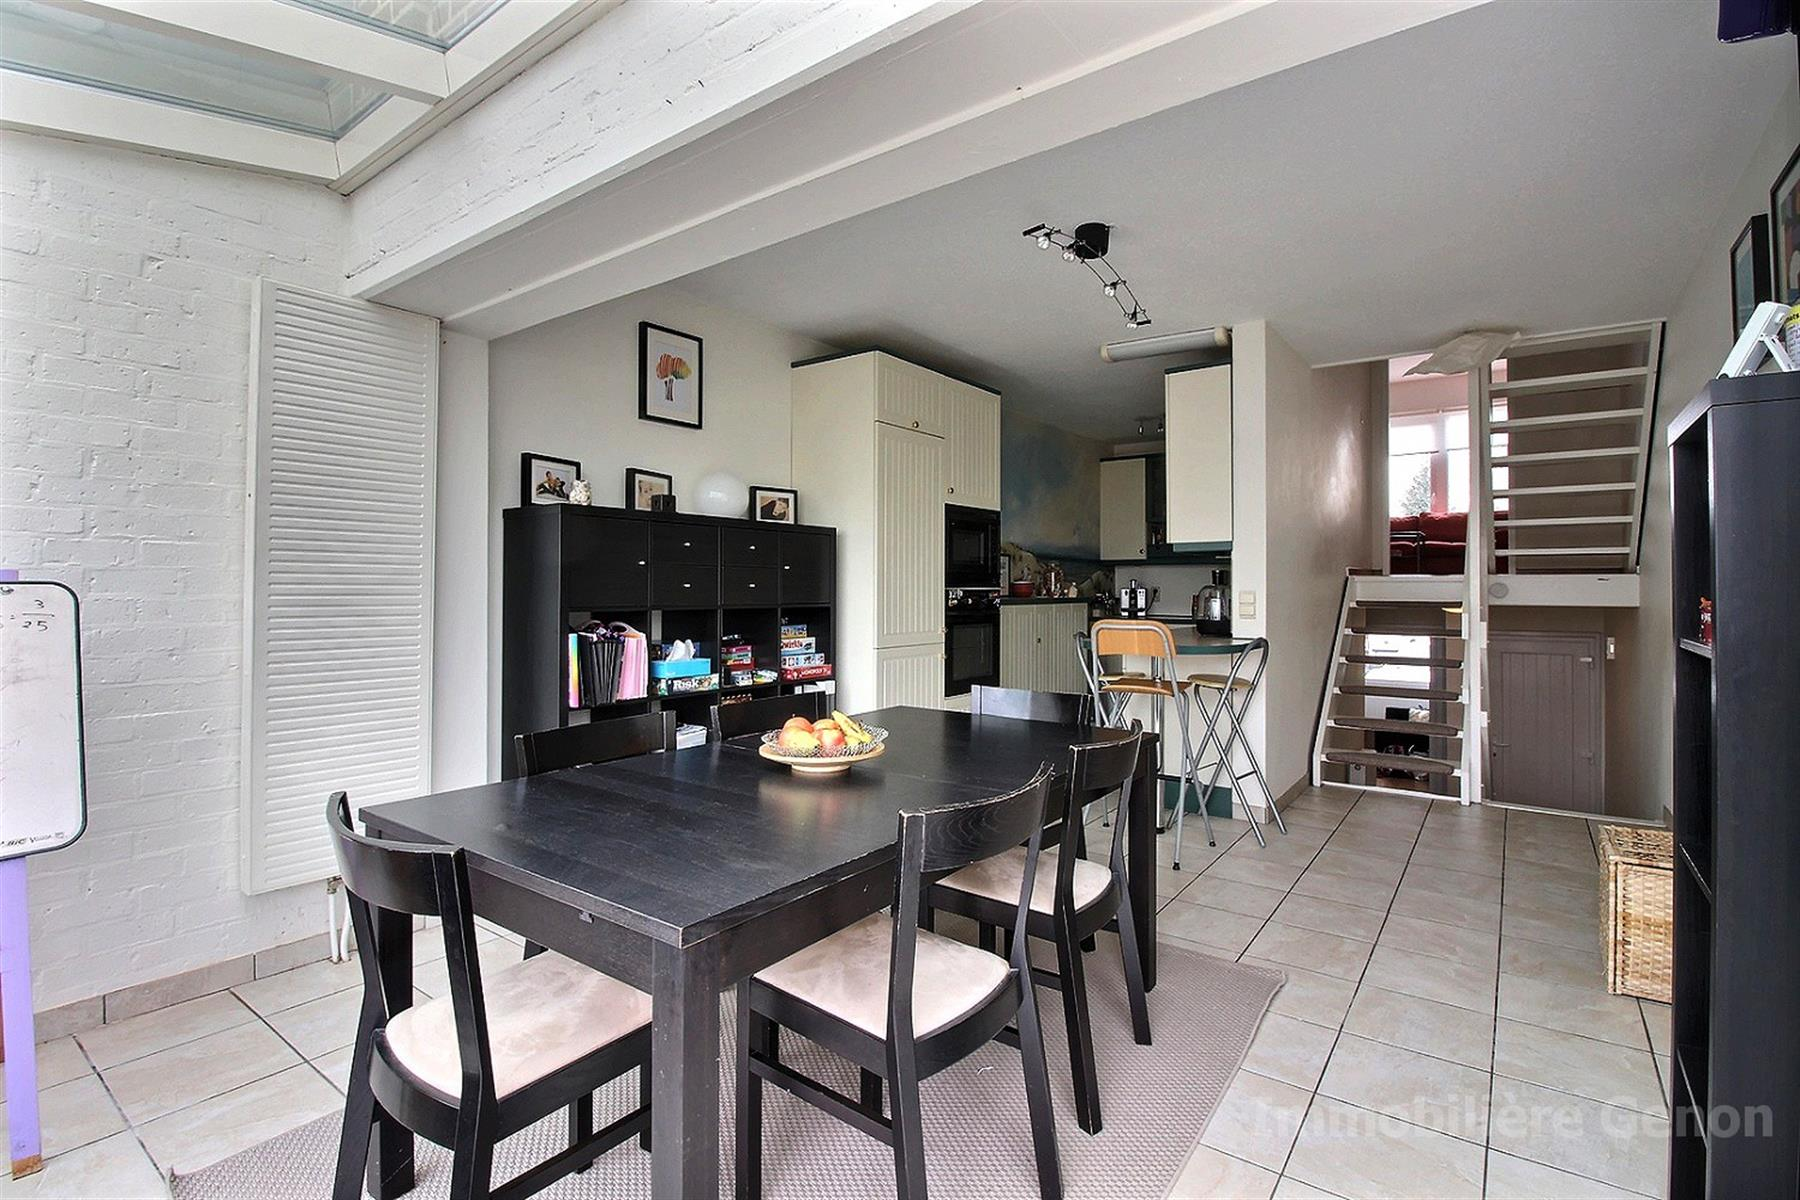 Maison - Ottignies-Louvain-la-Neuve - #4532084-2